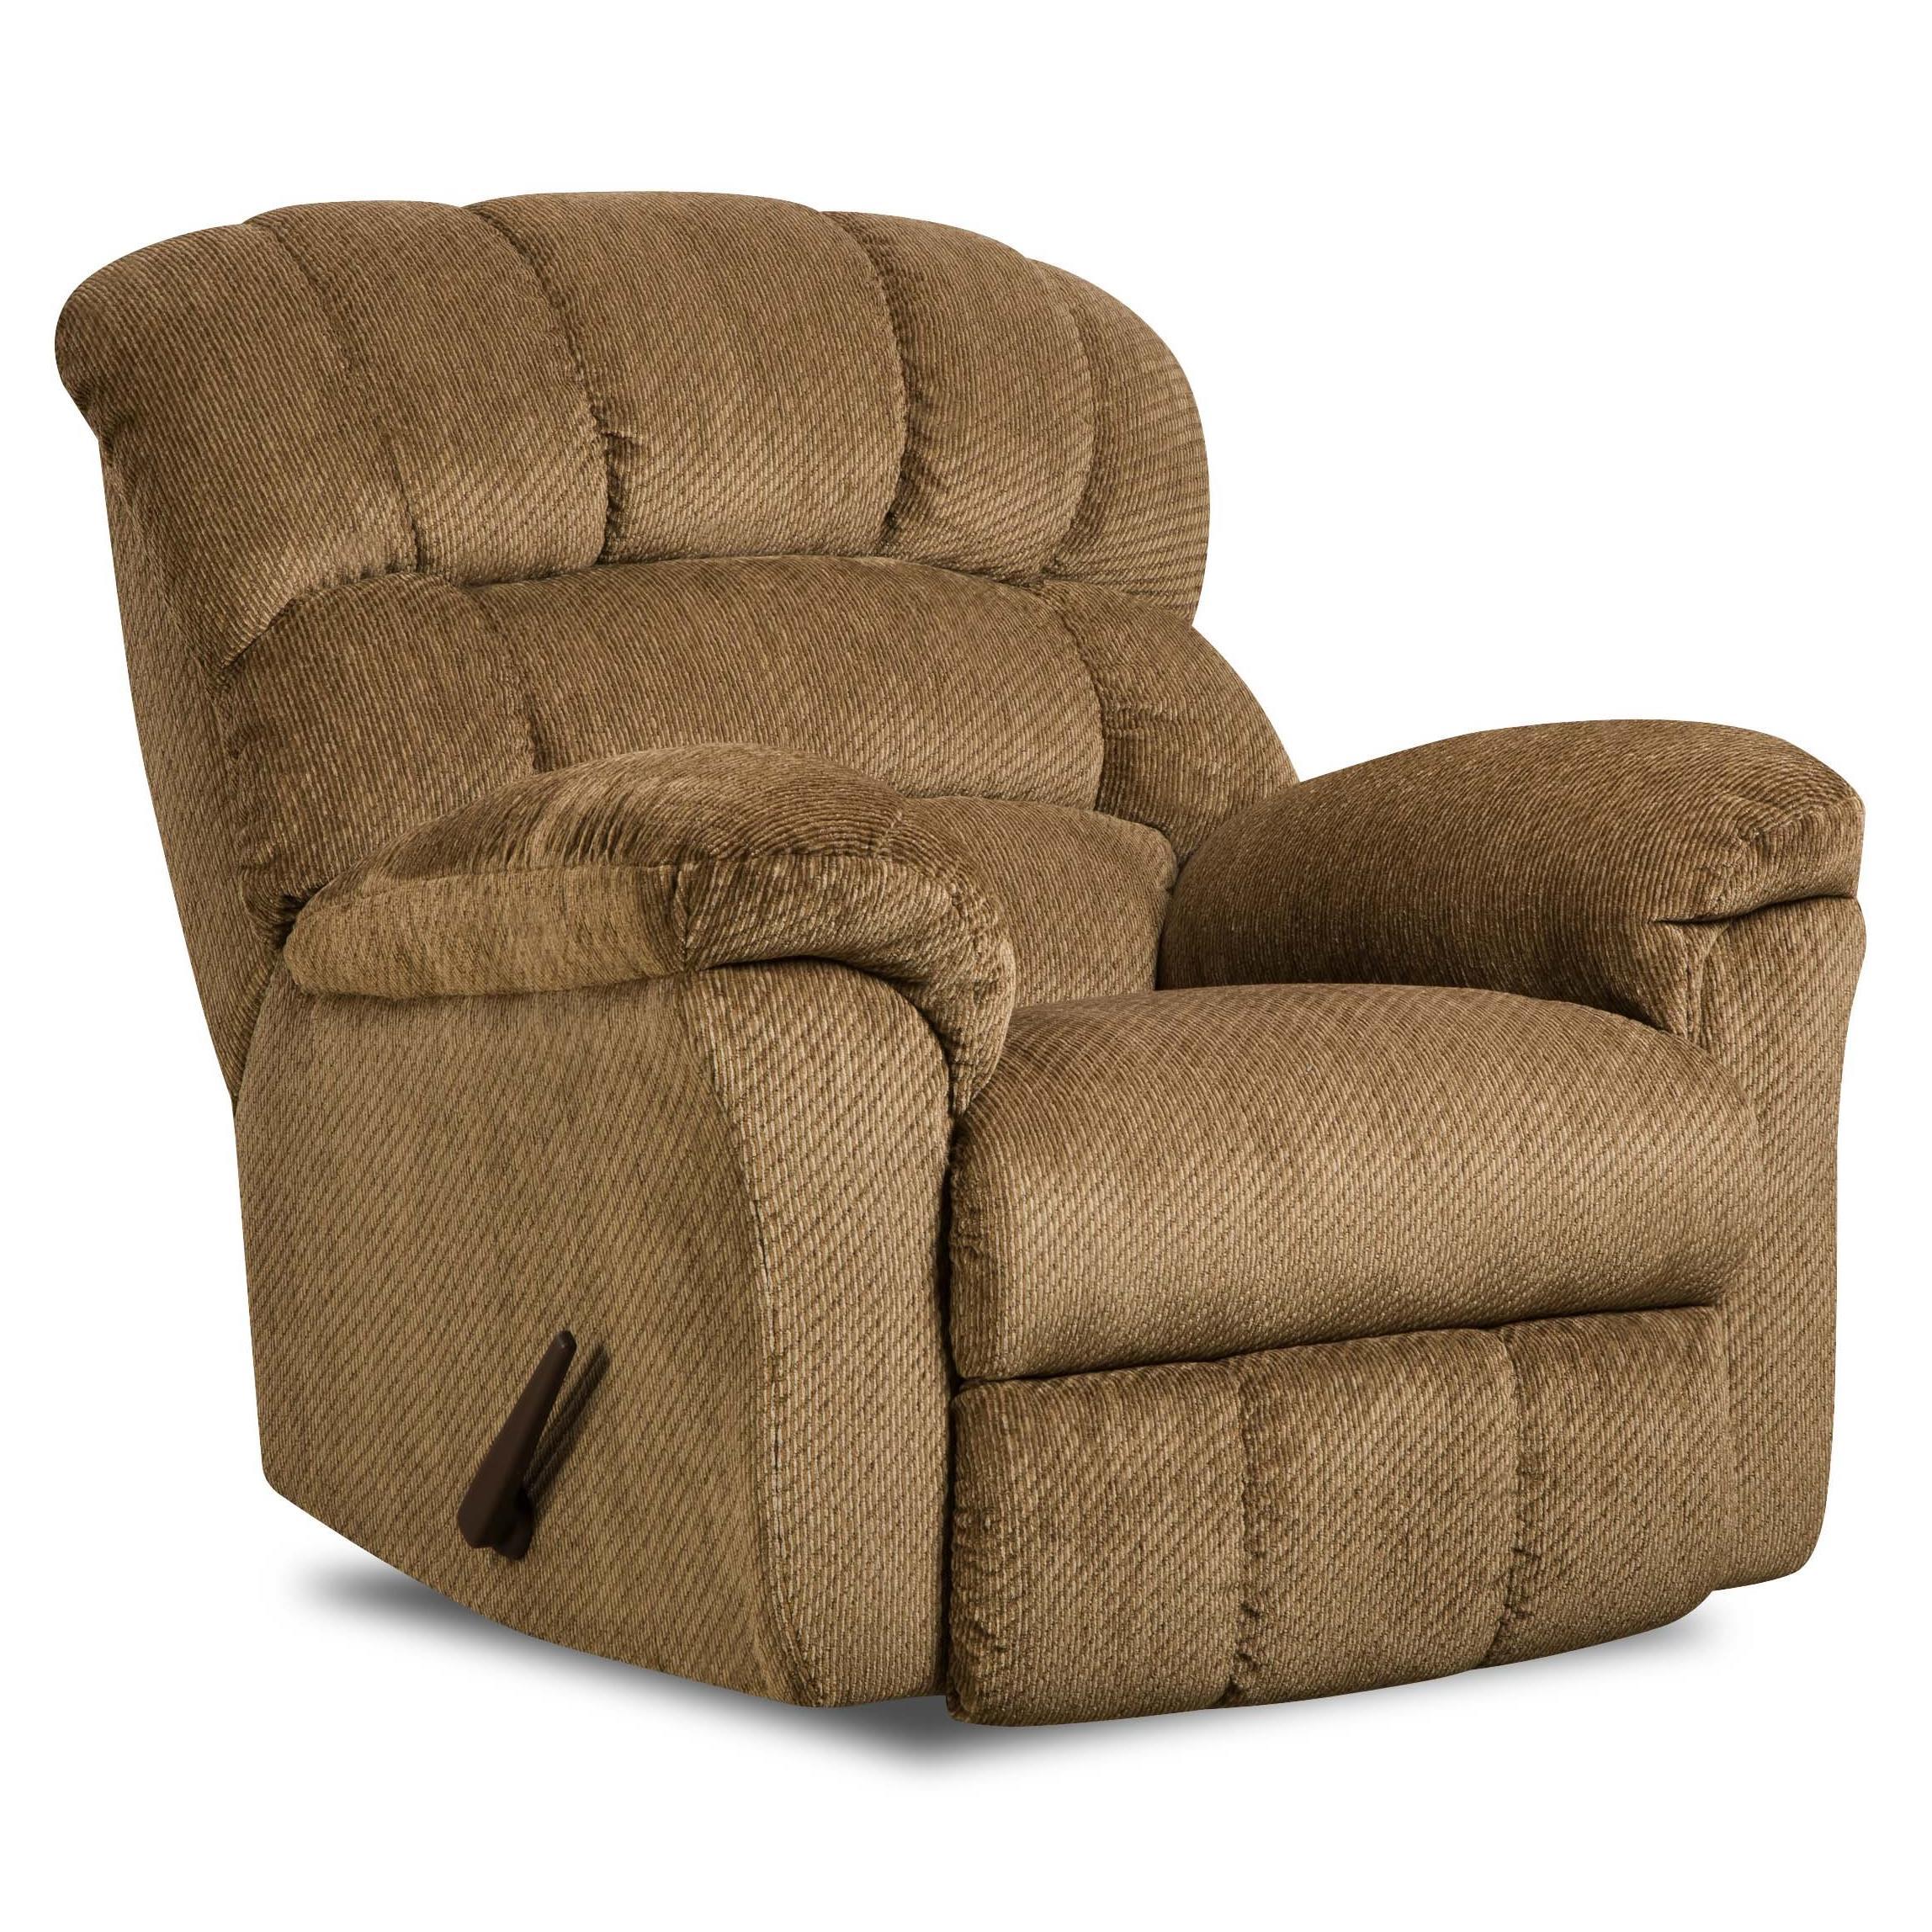 United Furniture Industries 558 Rocker Recliner - Item Number: 558 Recliner Amber